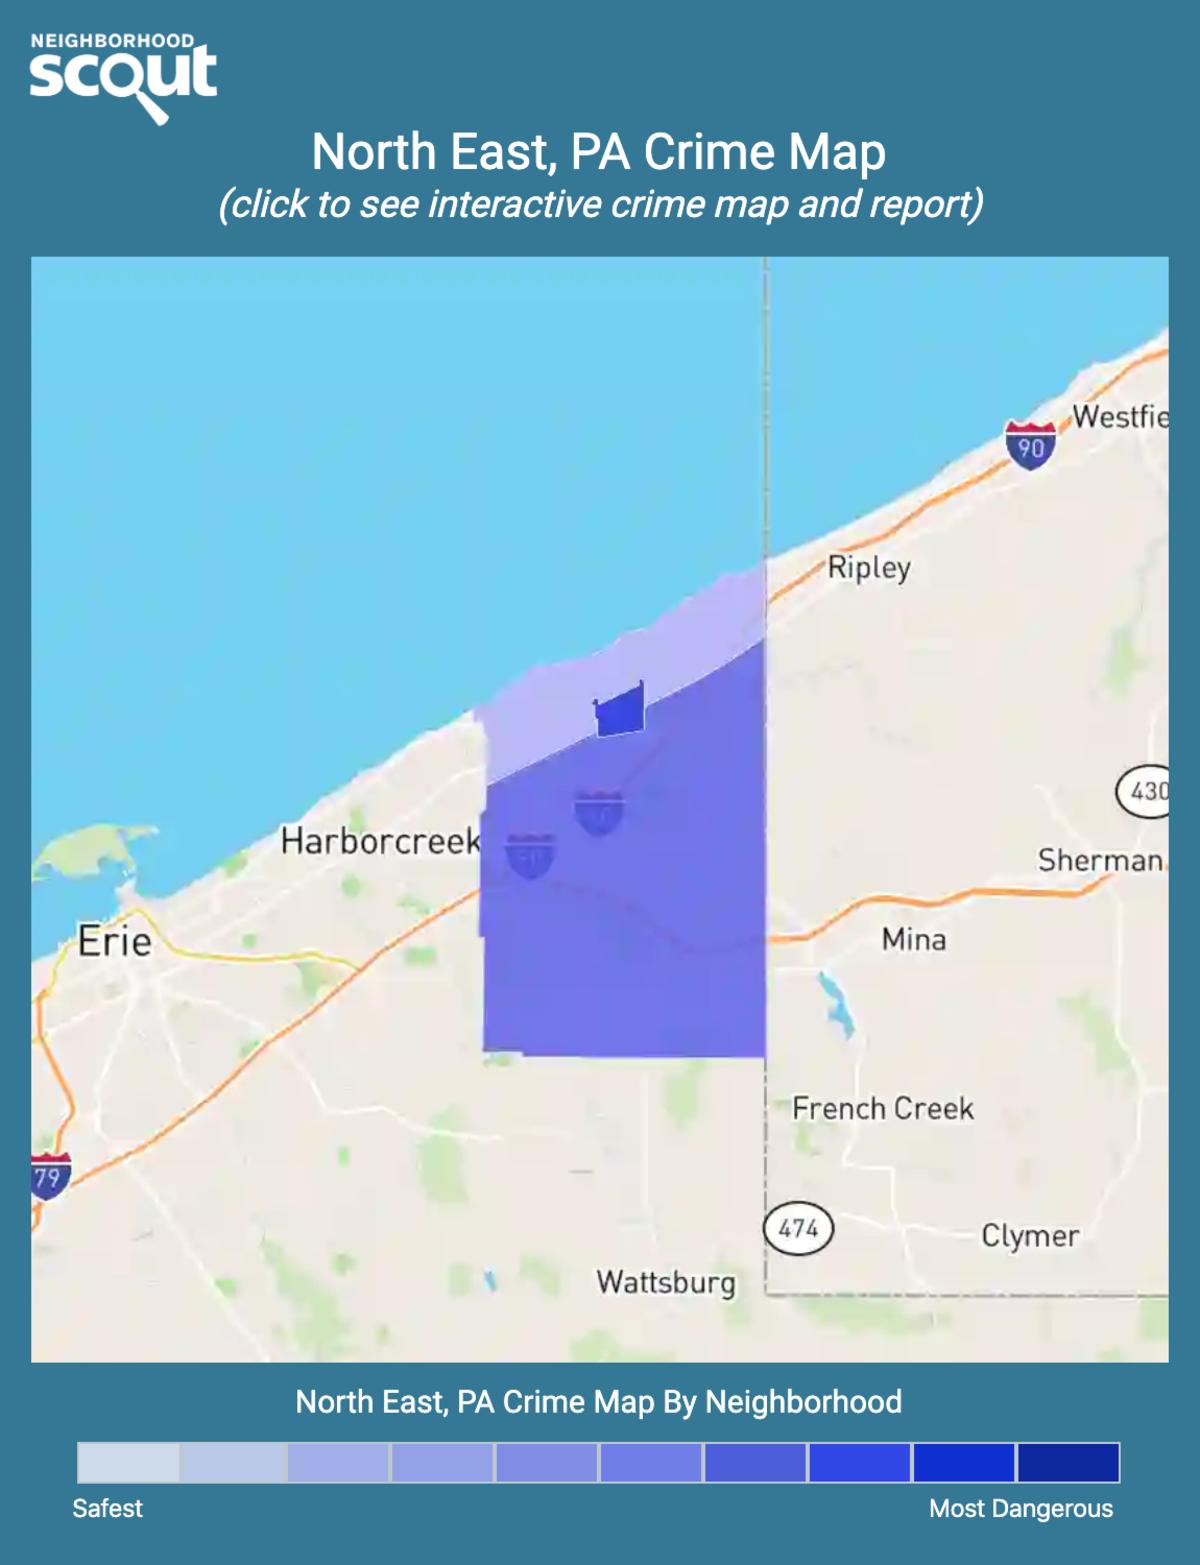 North East, Pennsylvania crime map